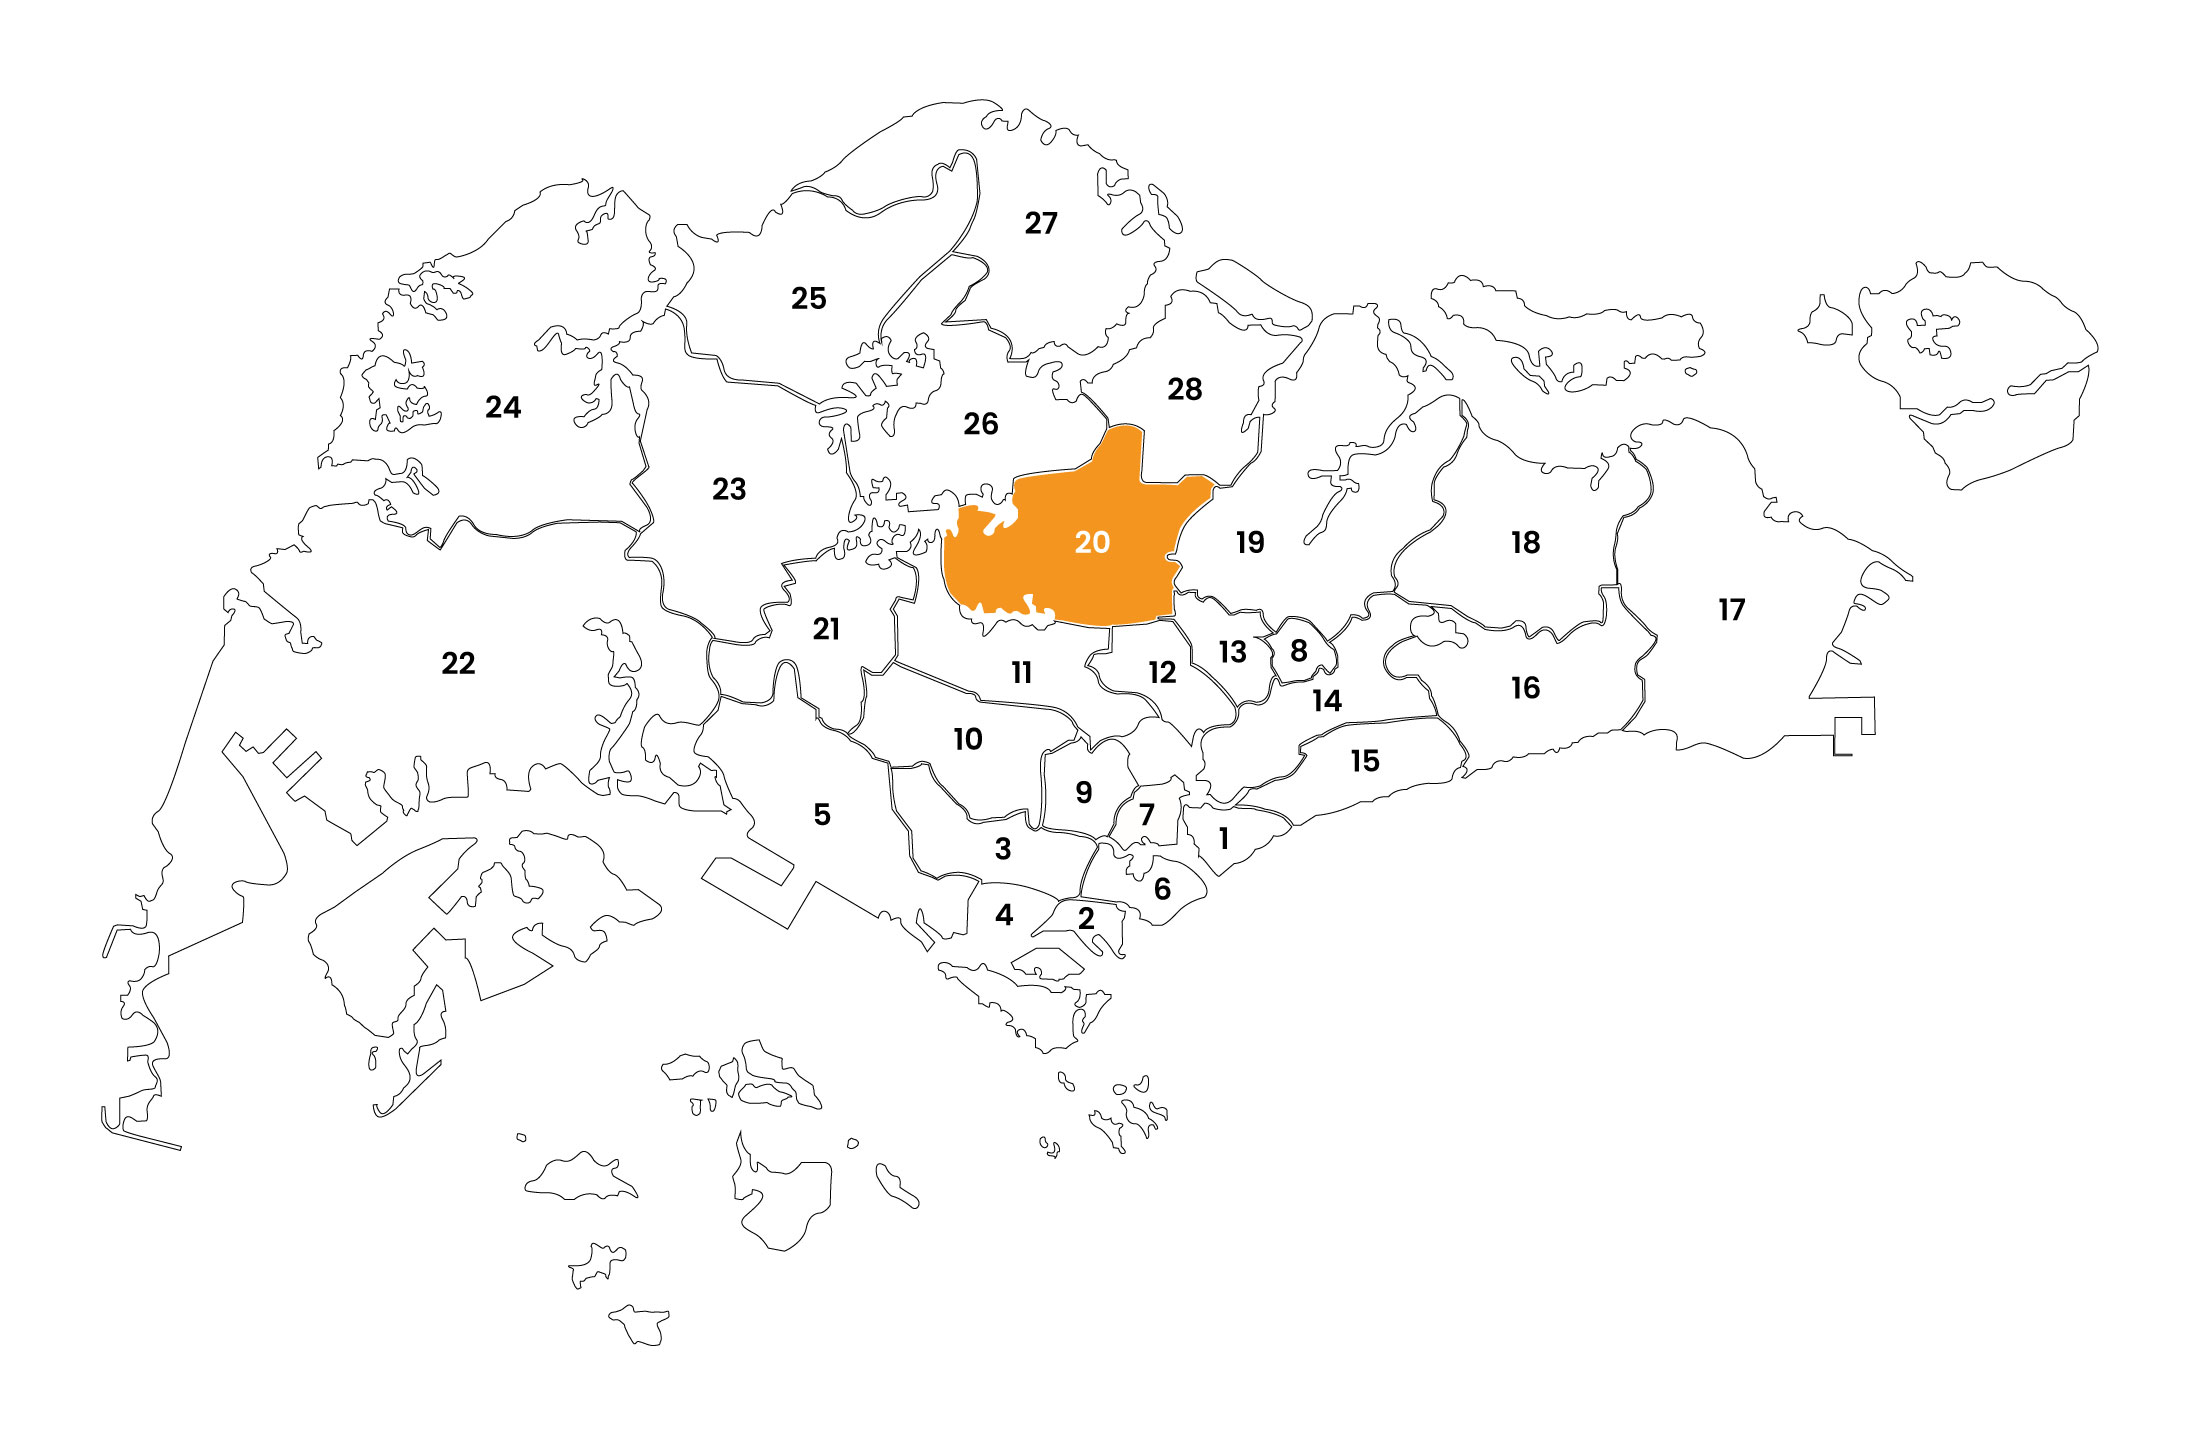 District 20